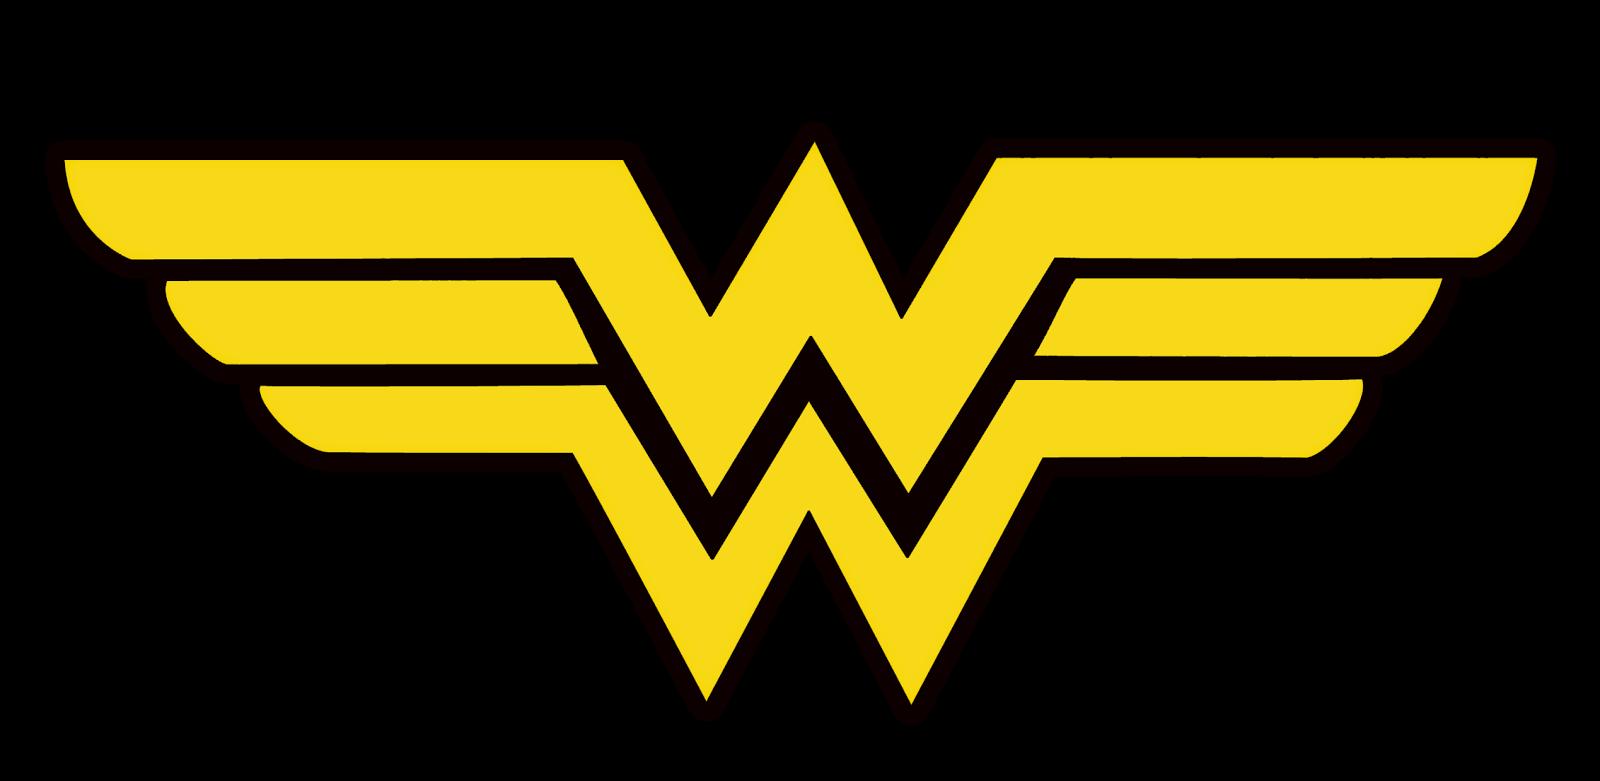 BLOG DE GIFS Y IMÁGENES | Wonder woman fiesta | Pinterest | Mujer ...